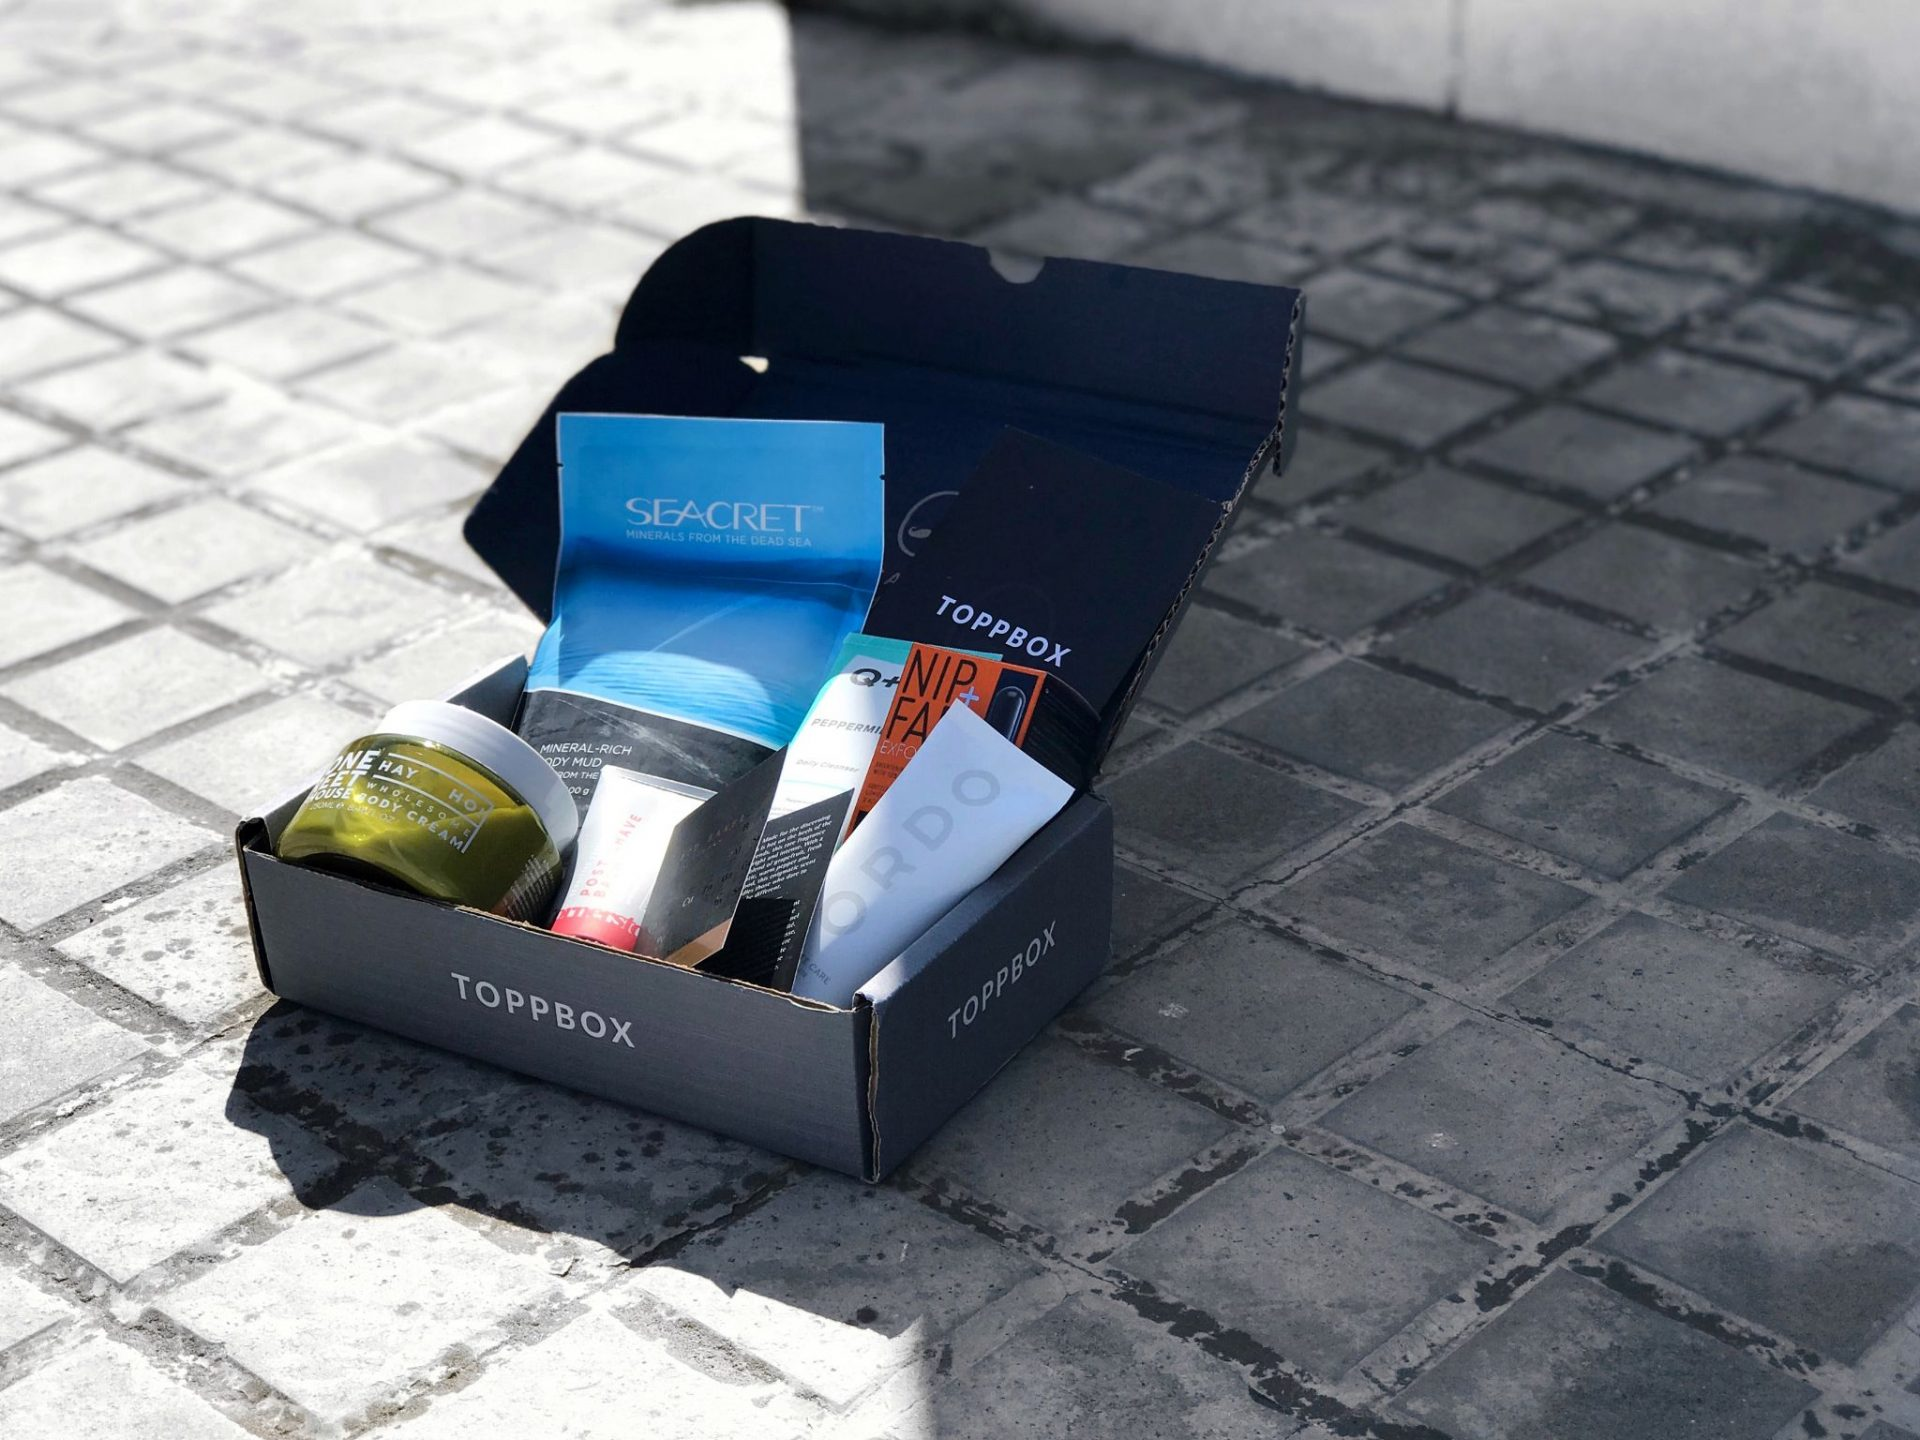 toppbox subscription box street pavement